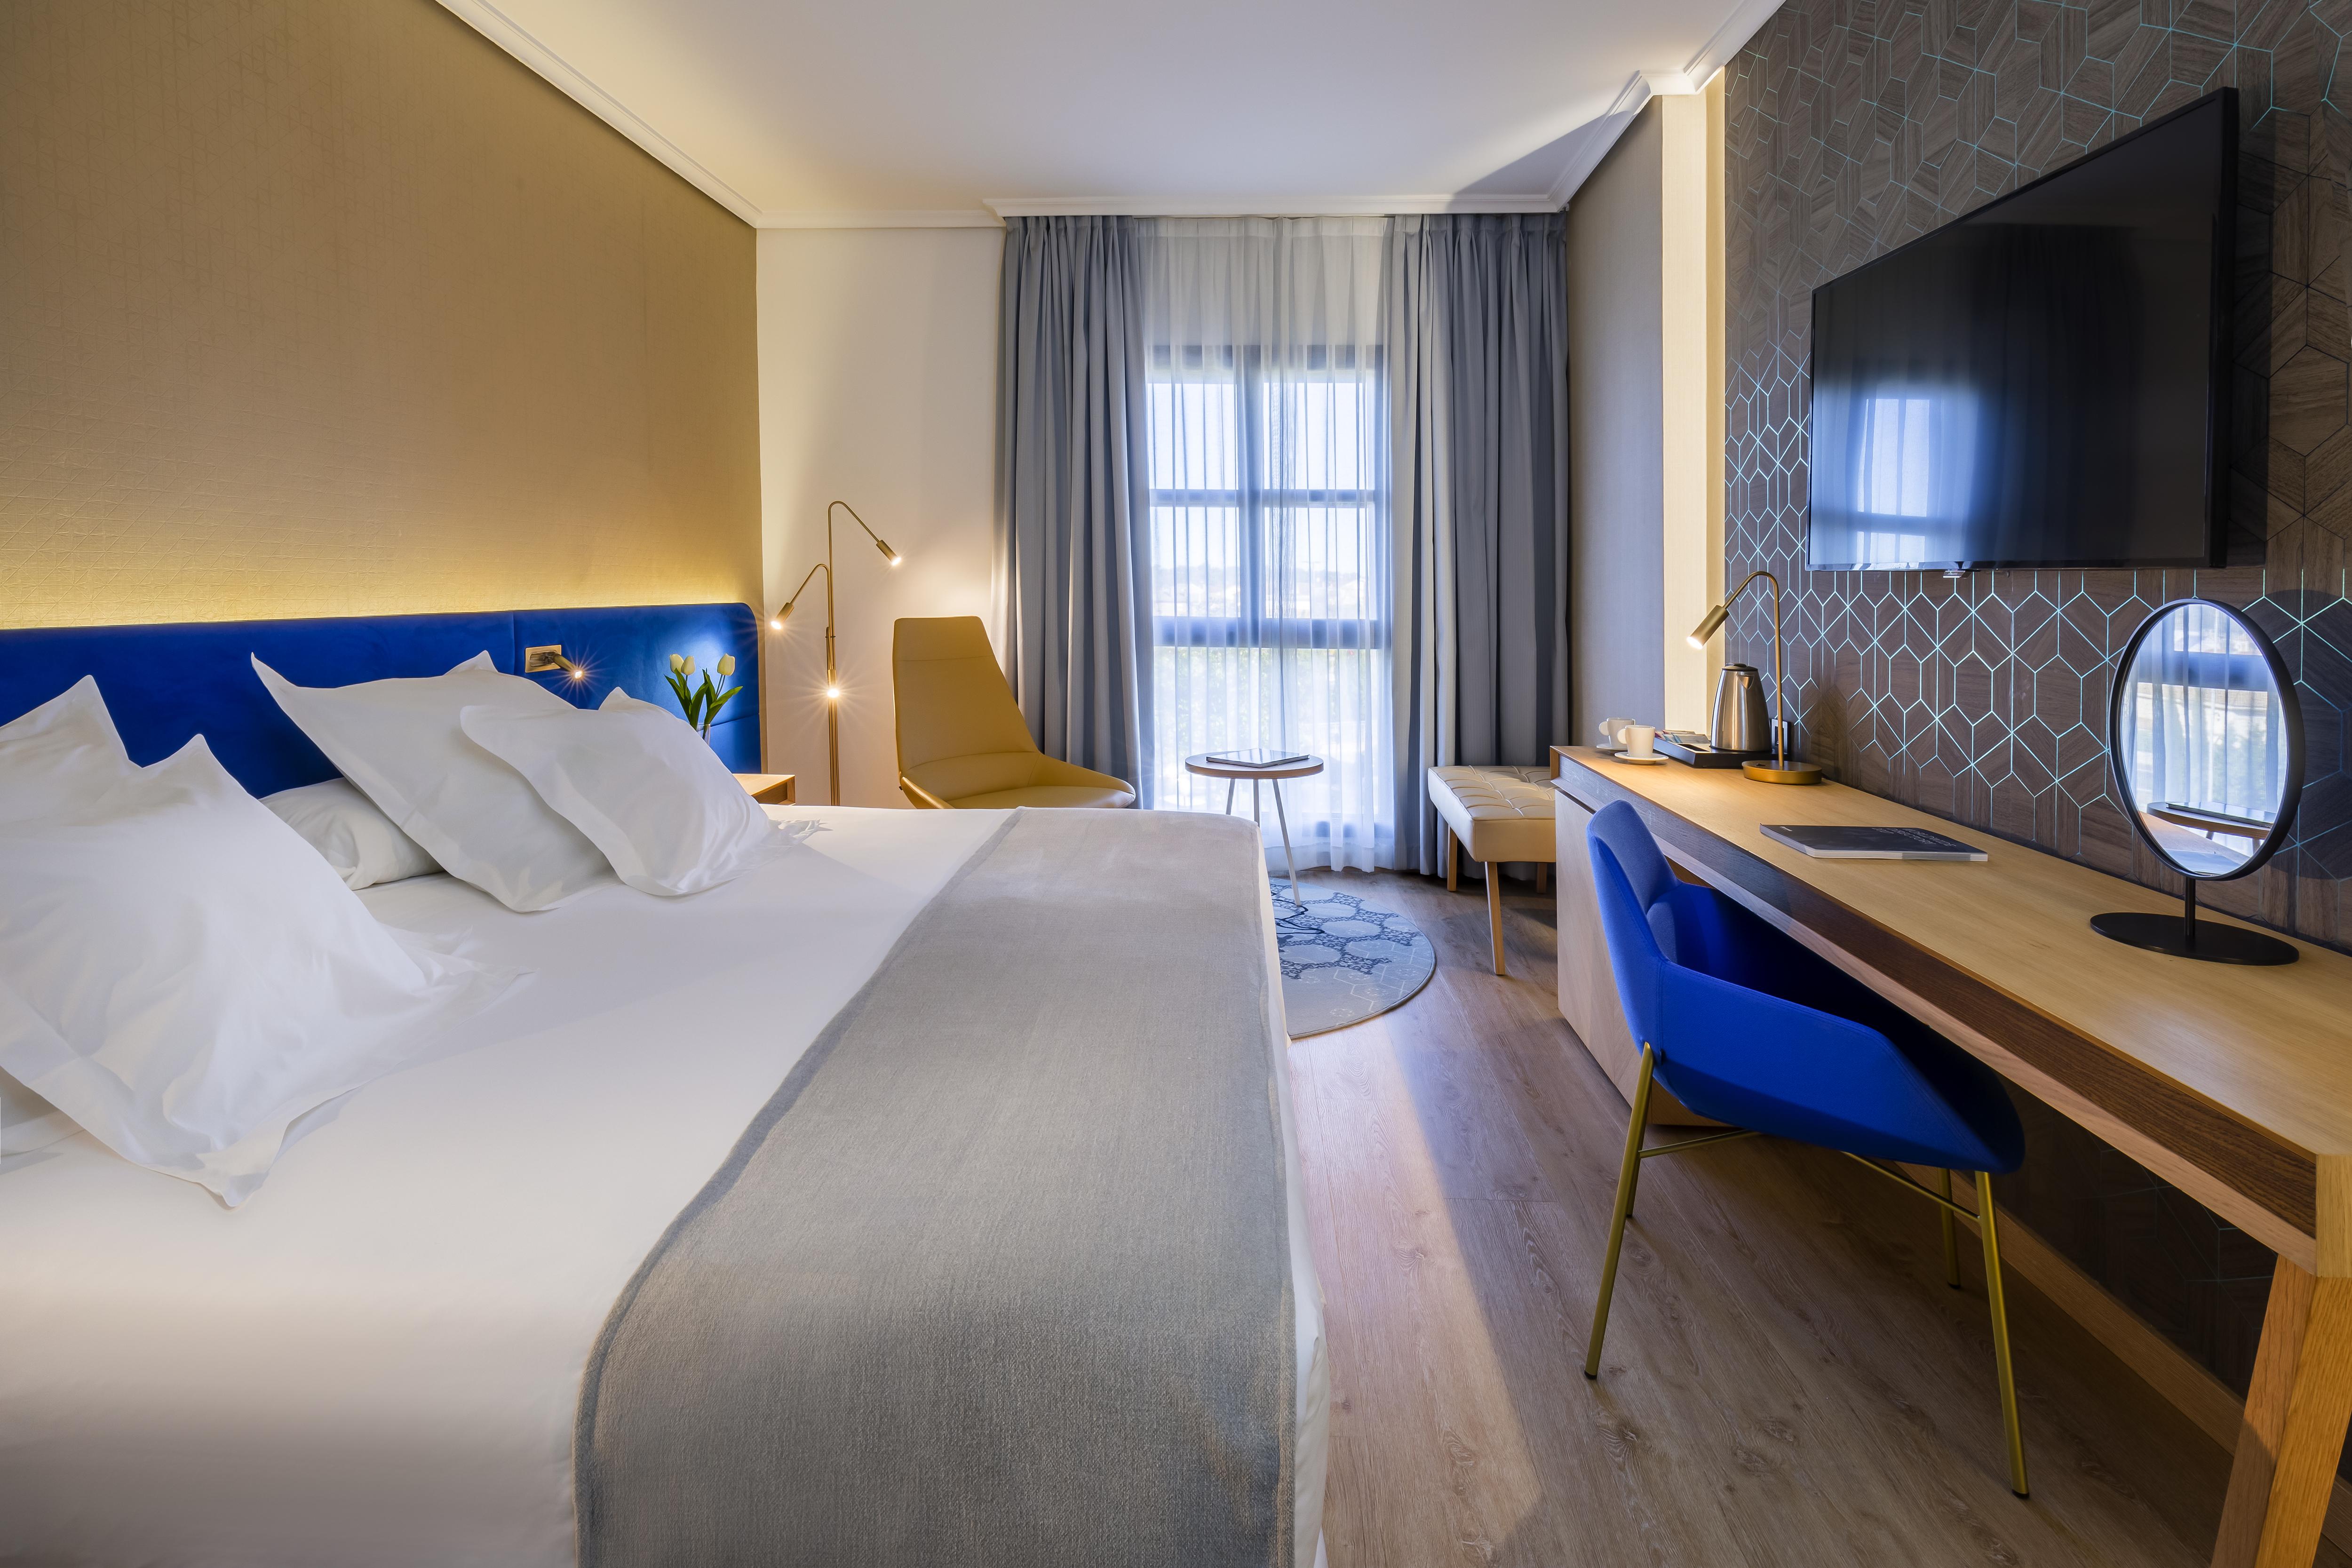 Hoteles barcel hotel group en espa a viajes el corte ingl s - Hoteles barcelo en madrid ...